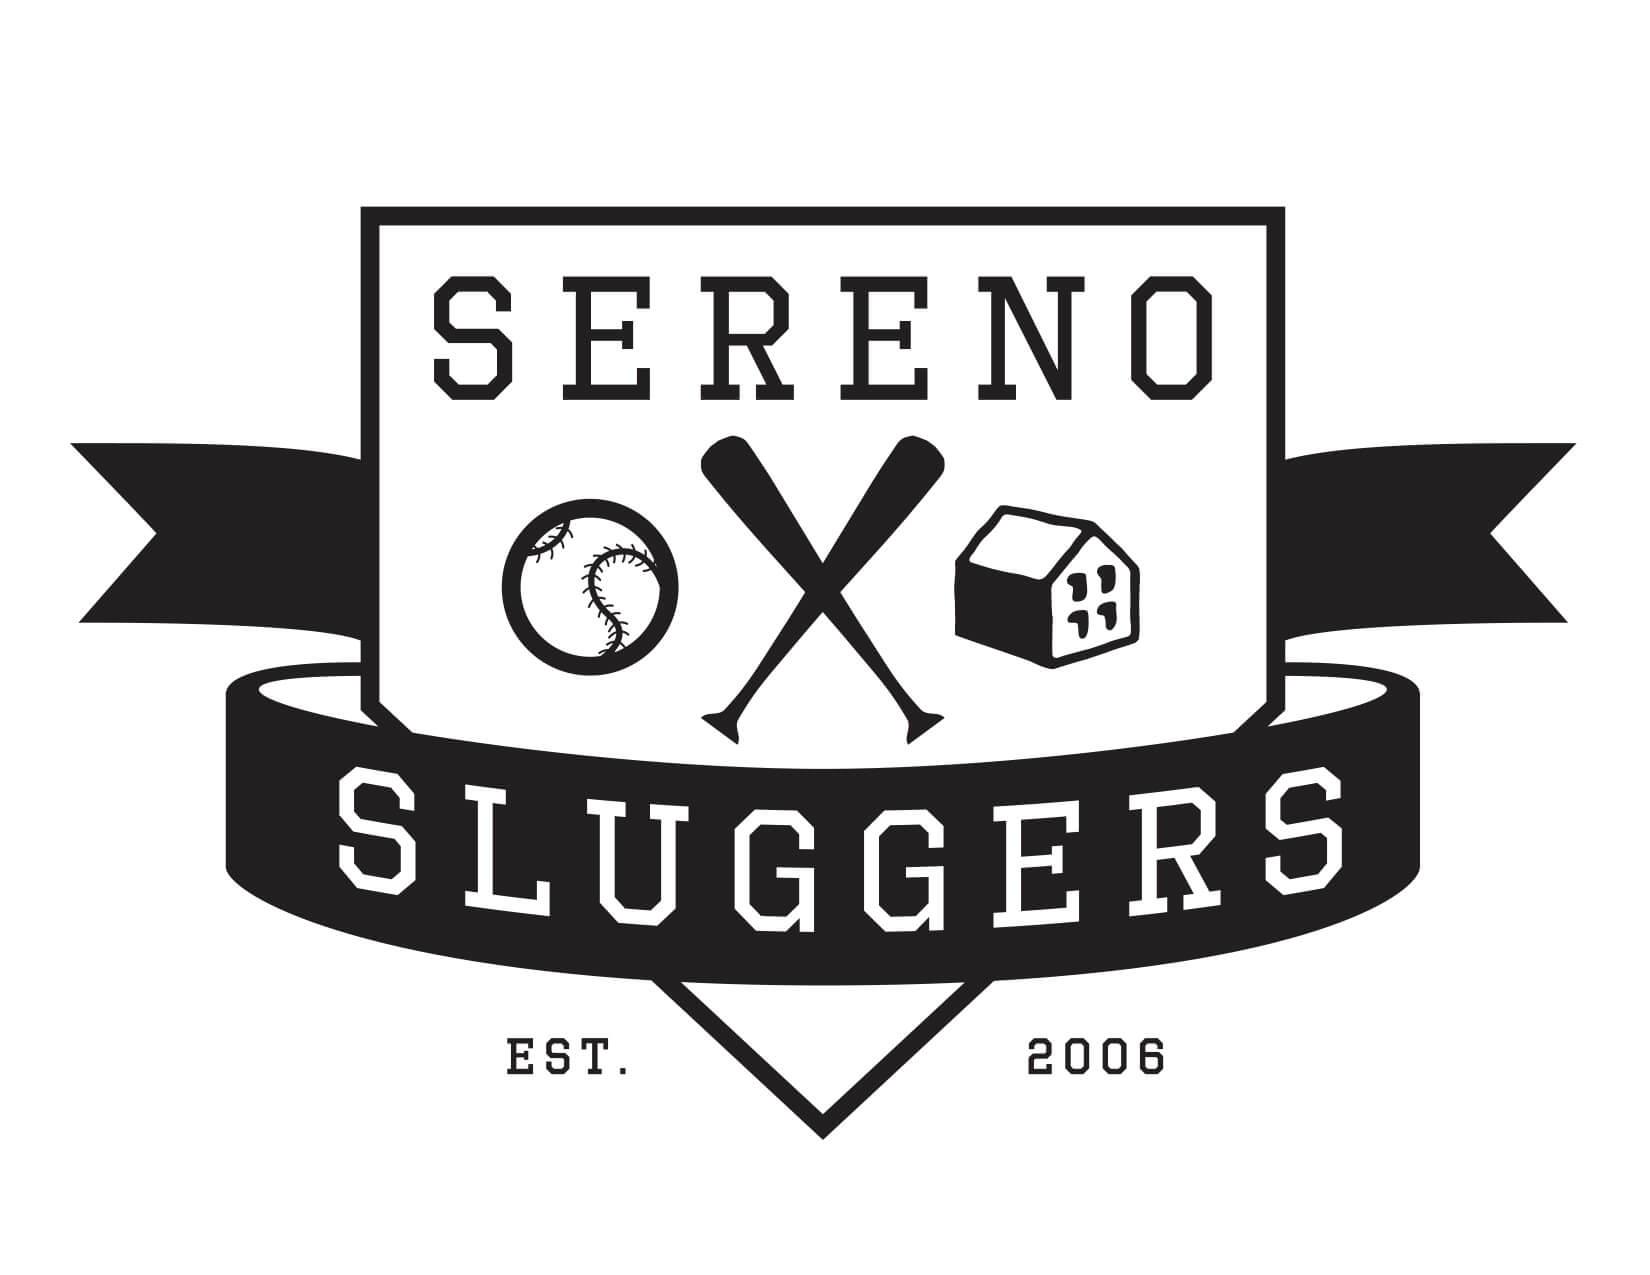 Sereno Group Sponsorship Shirt - Make-A-Wish Softball Tournament